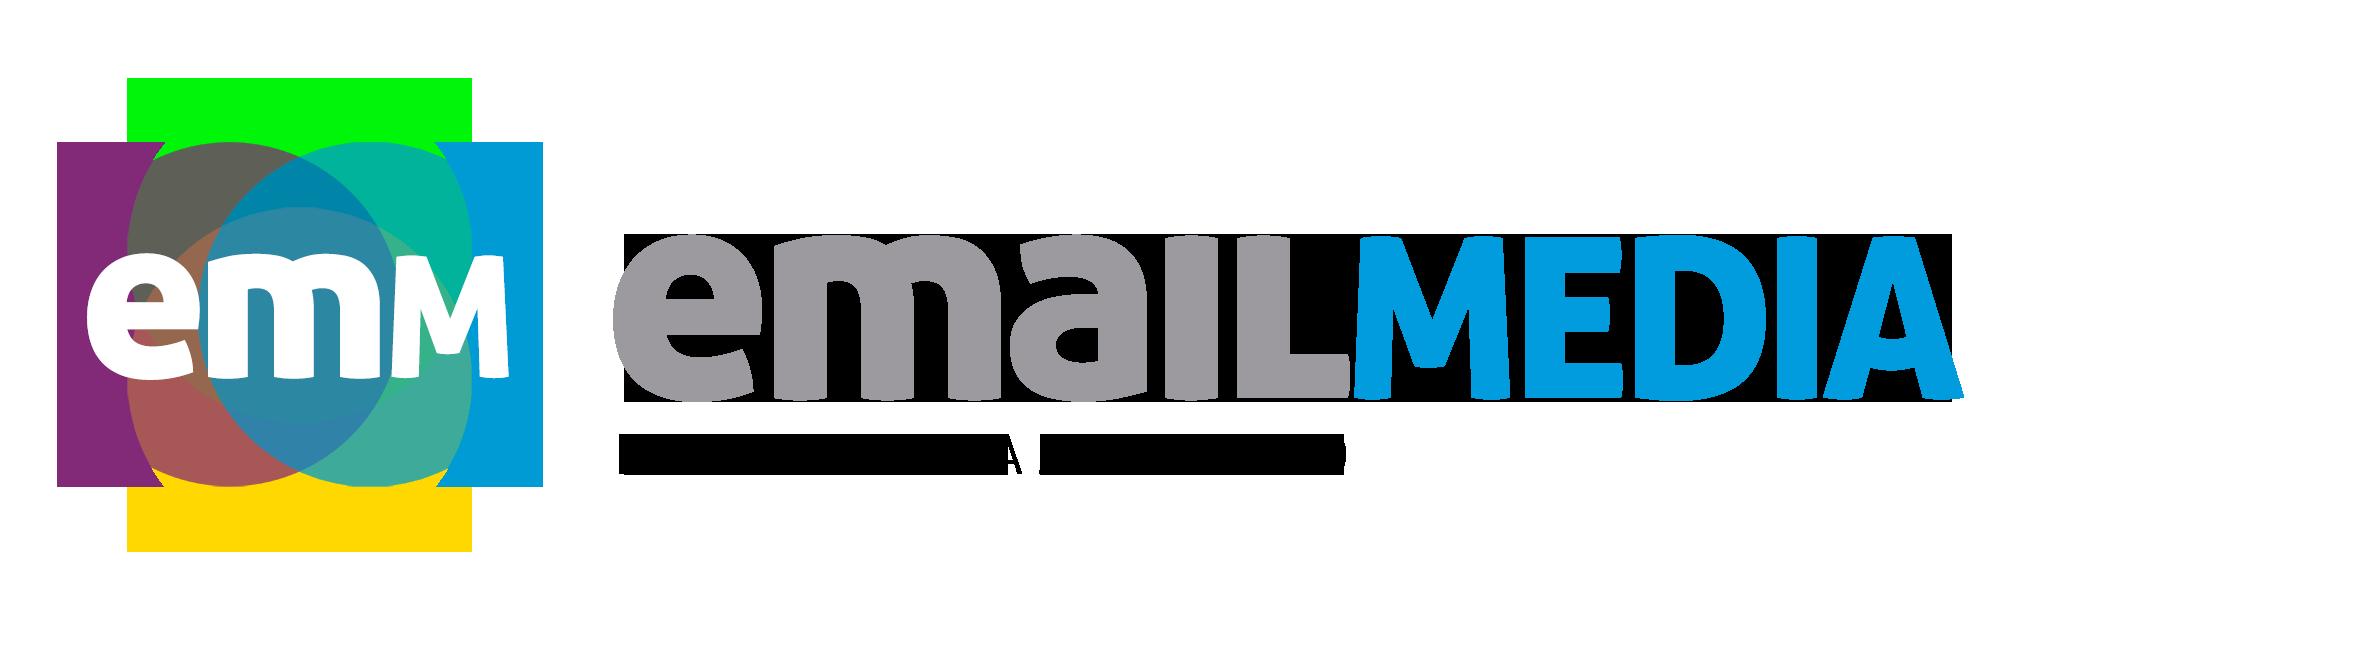 Emailmedia